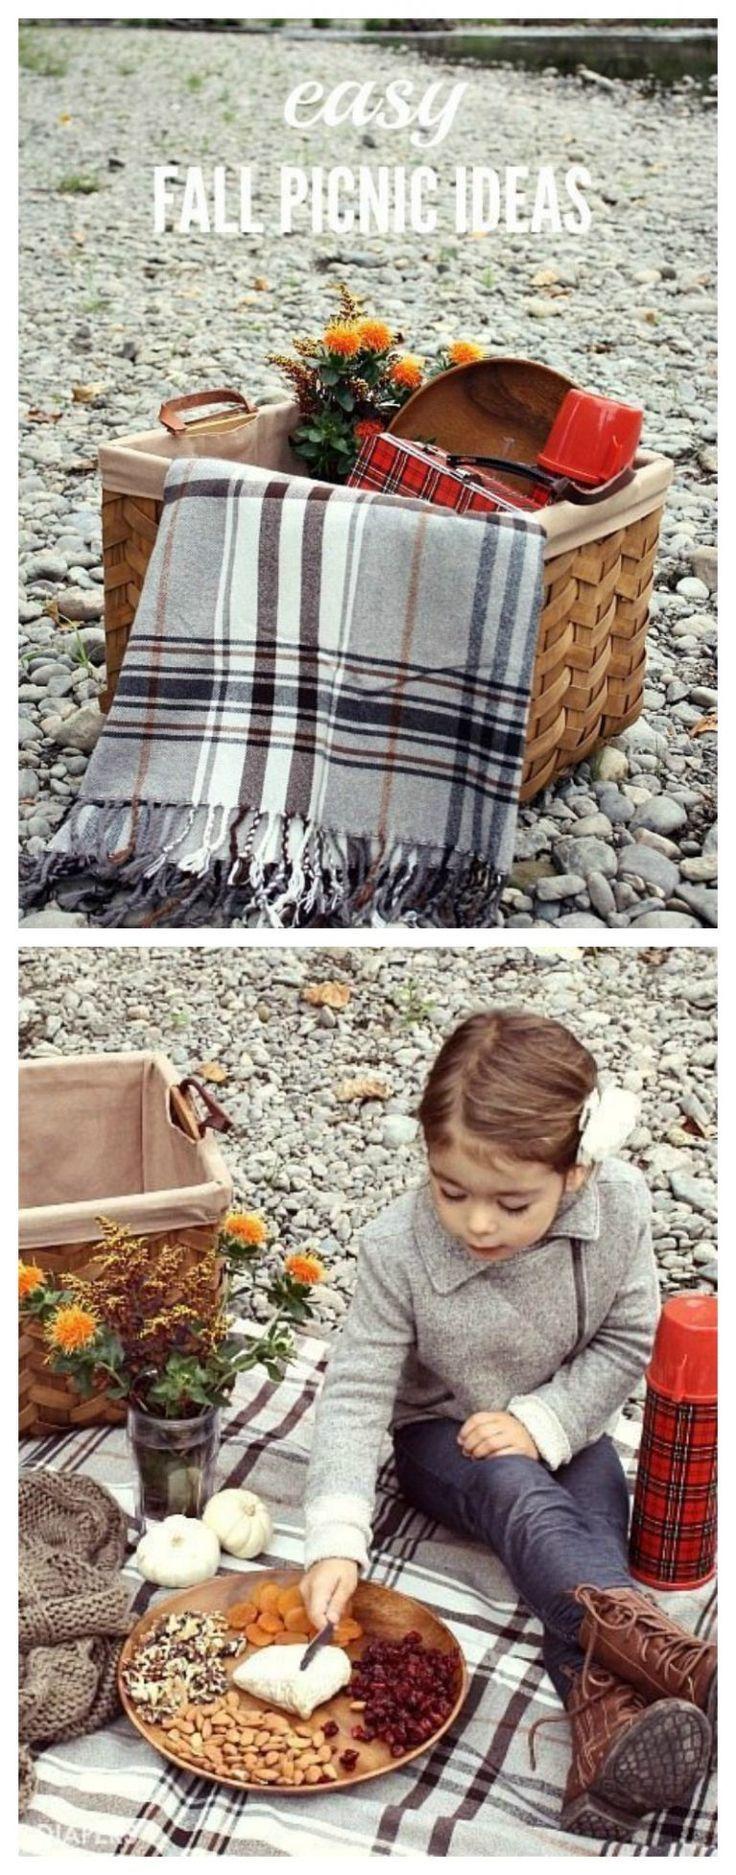 Easy Fall Picnic Ideas #familypicnicfoods